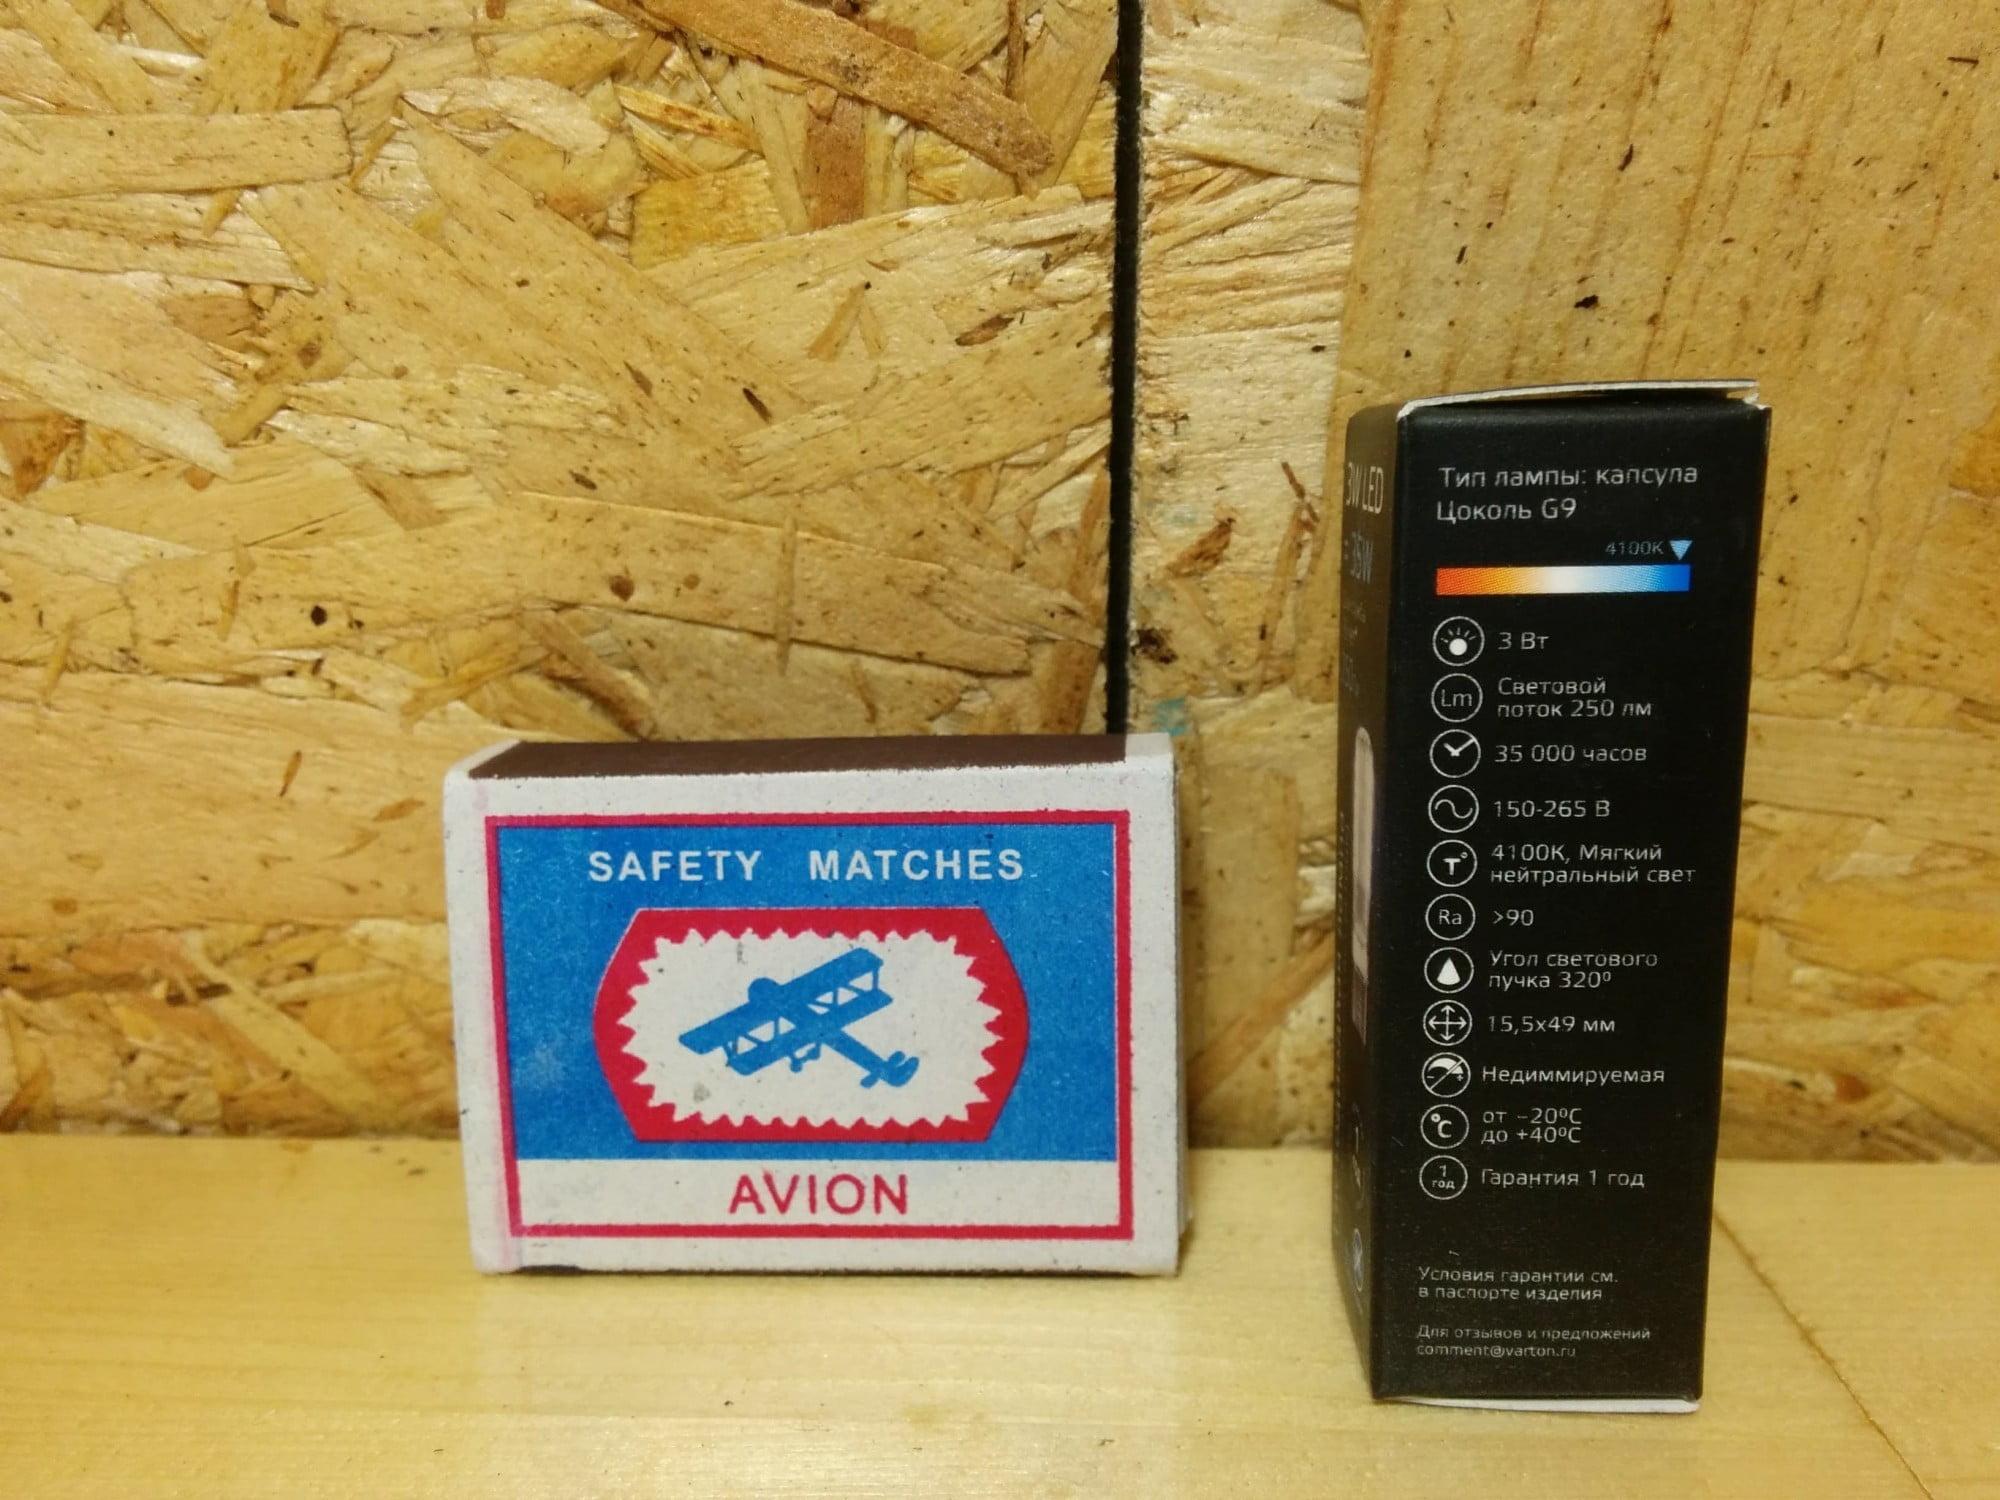 Gauss LED G9 AC185-265V 3W 4100K характеристики